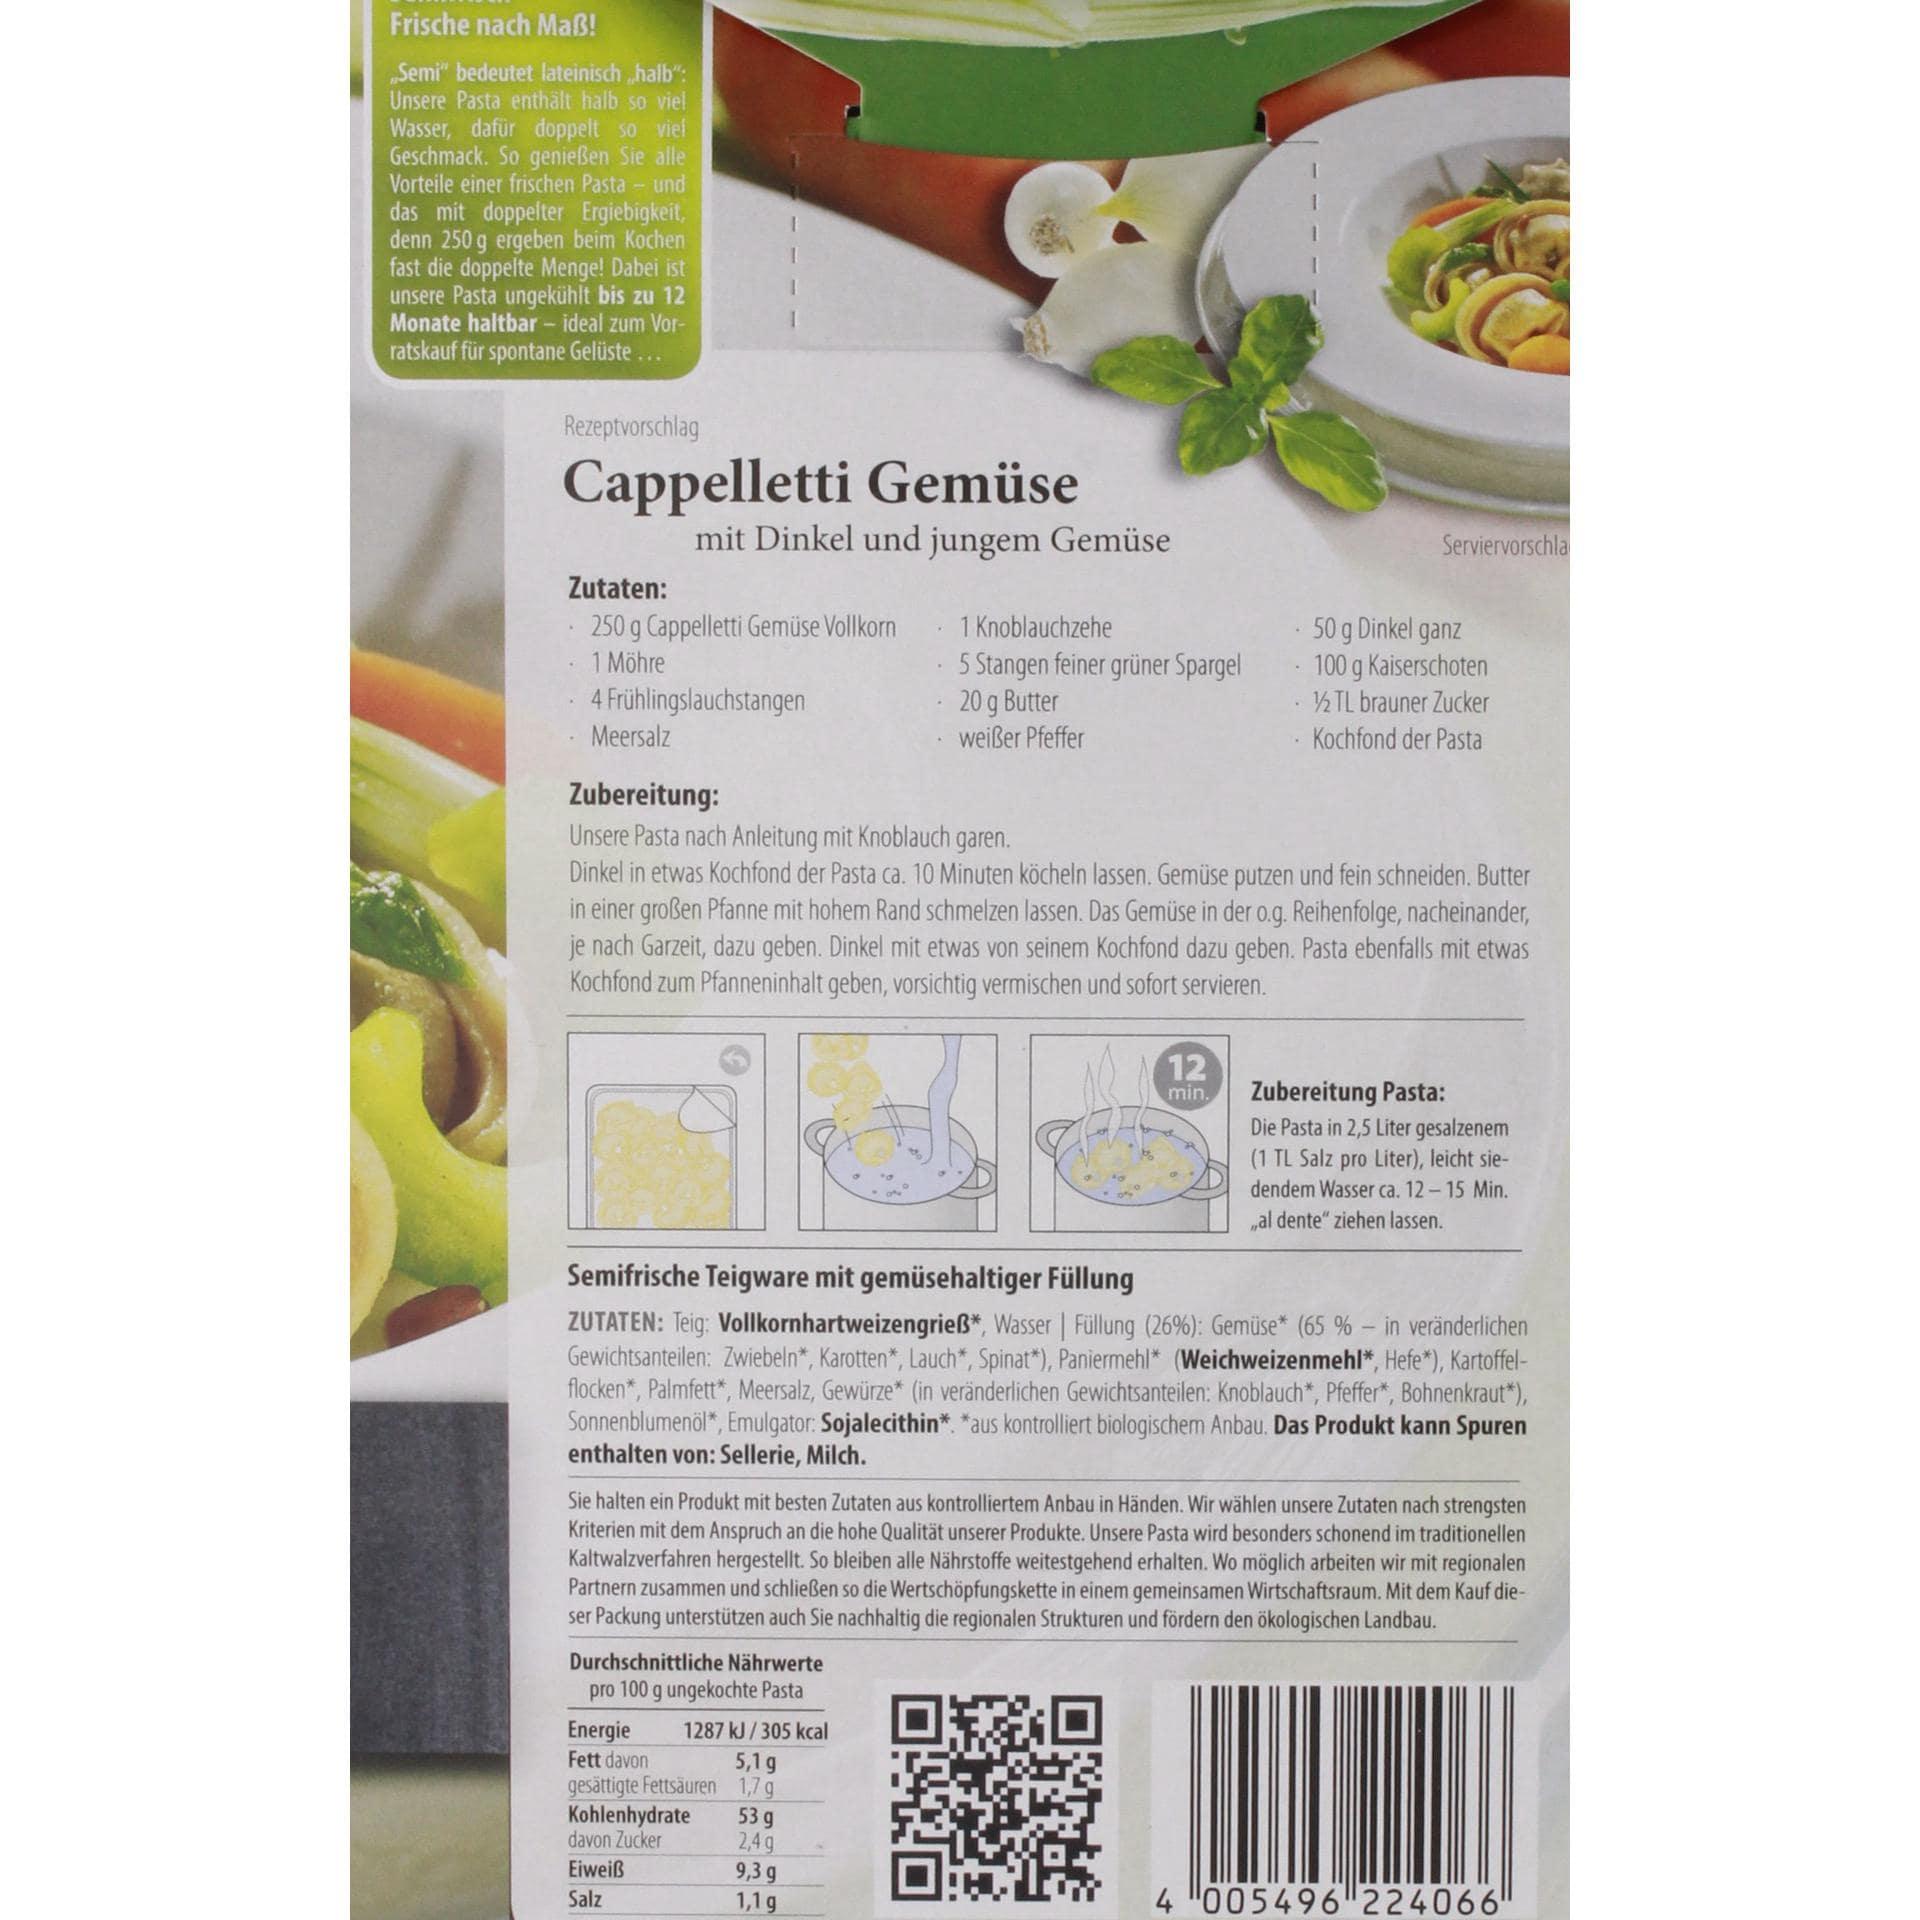 D'Angelo Bio Cappelletti Vollkorn Gemüse 250g